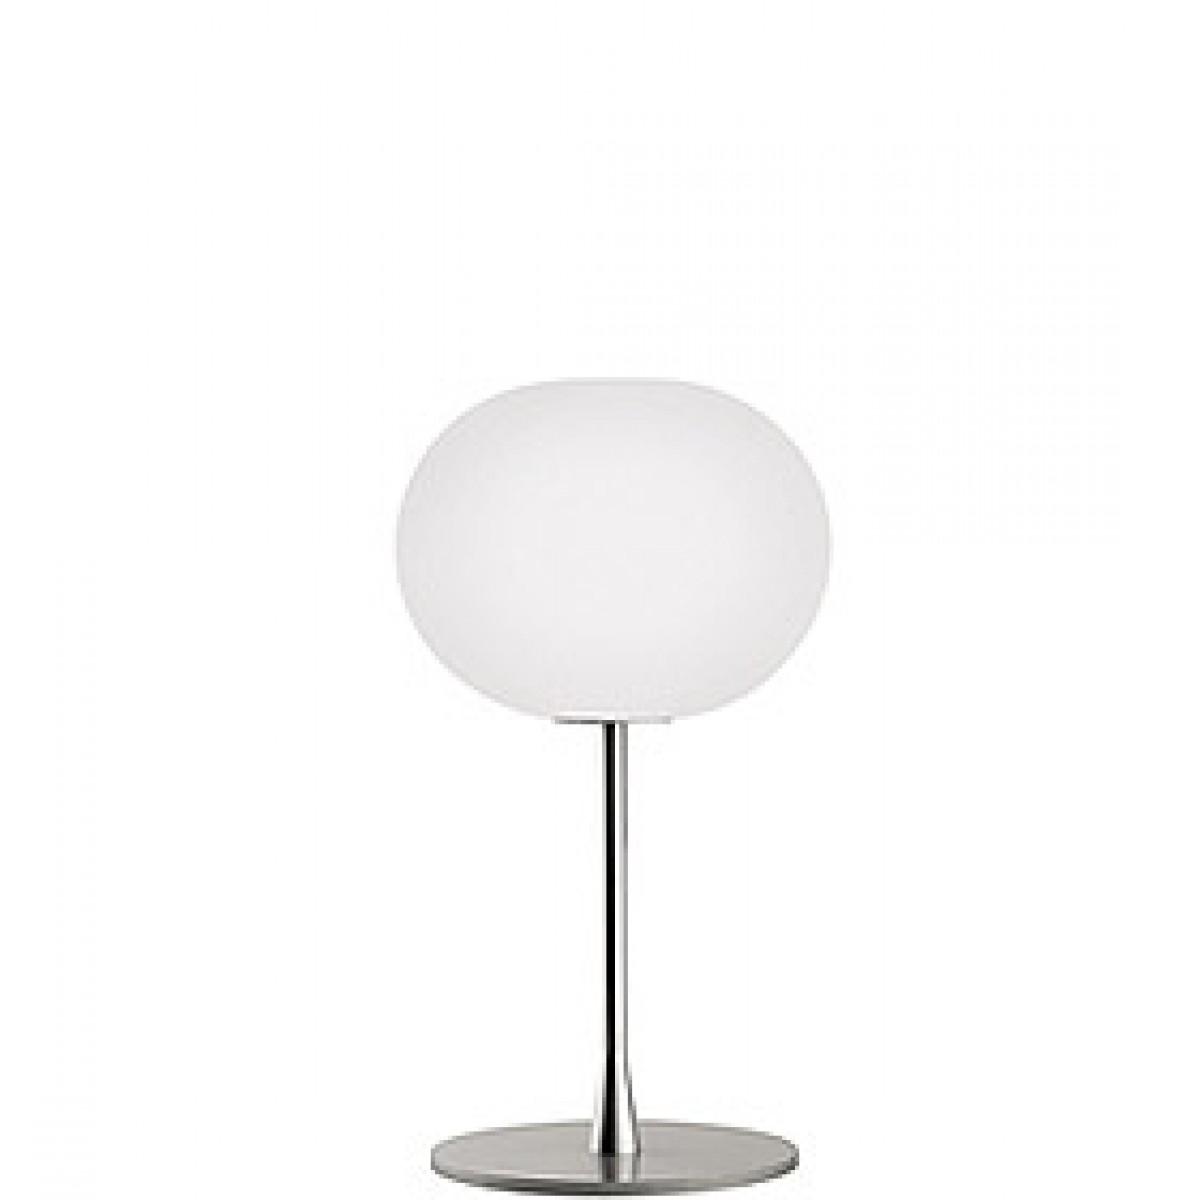 Glo ball t 1 lampada da tavolo di flos lampade da tavolo for Lampada da tavolo design flos